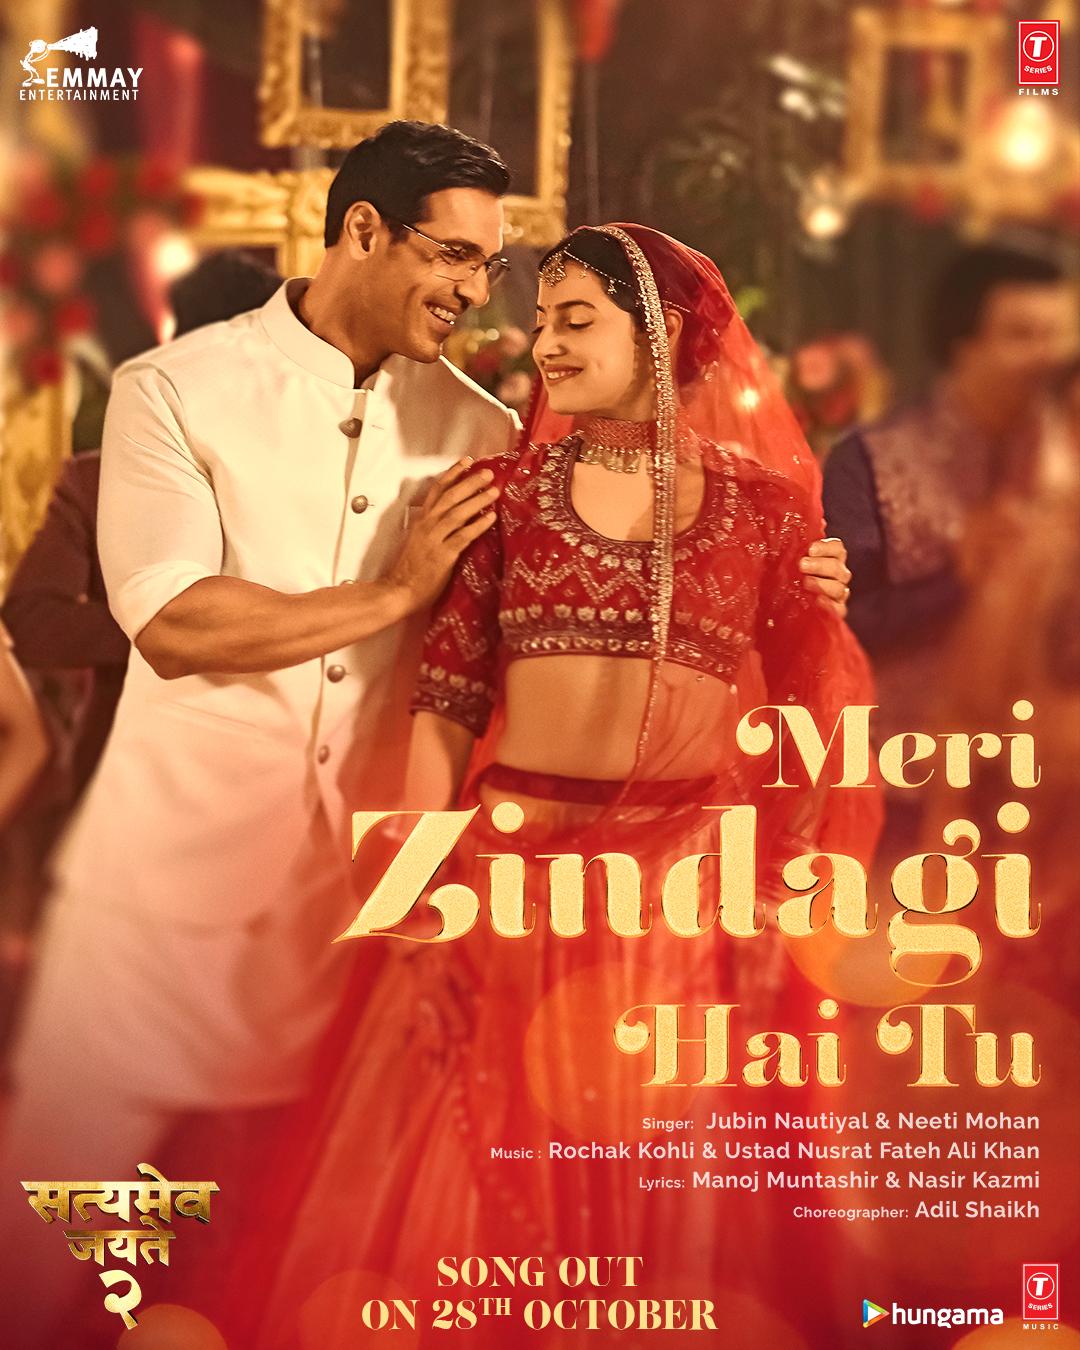 Meri Zindagi Hai Tu (Satyameva Jayate 2) 2021 Hindi Movie Video 1080p HDRip Download